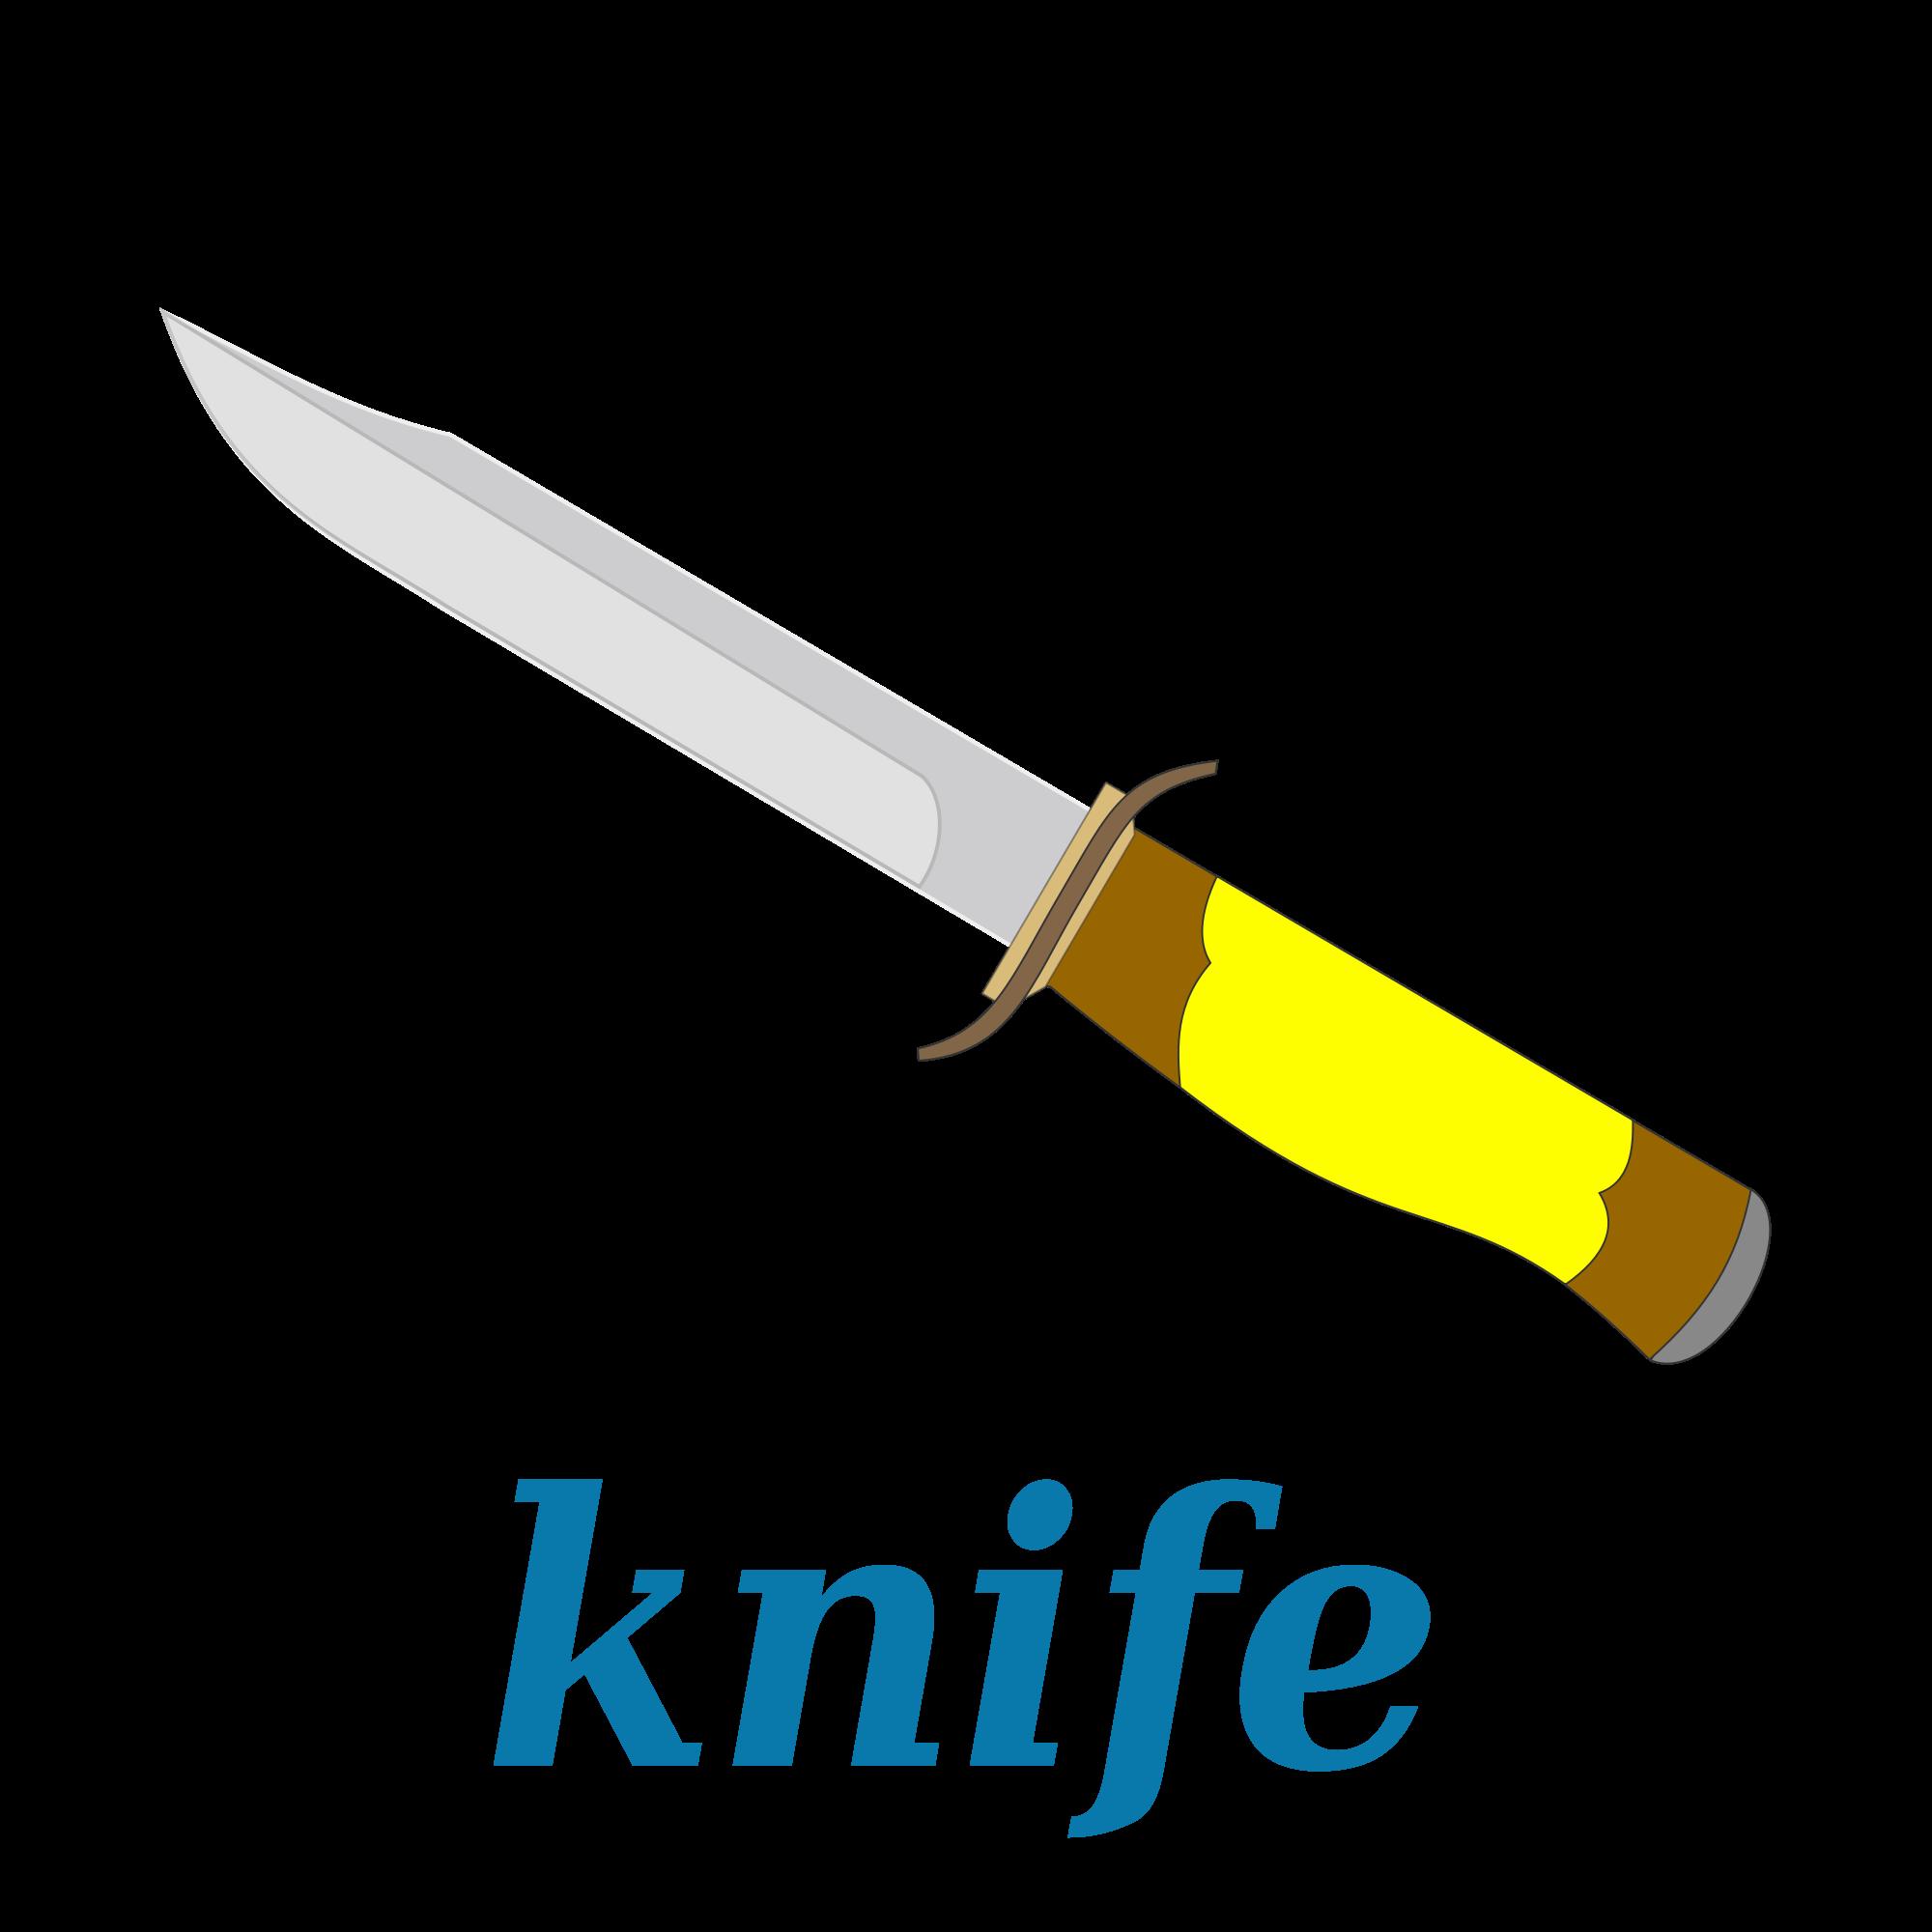 Hunting clipart knife. File wikivoc svg wikimedia